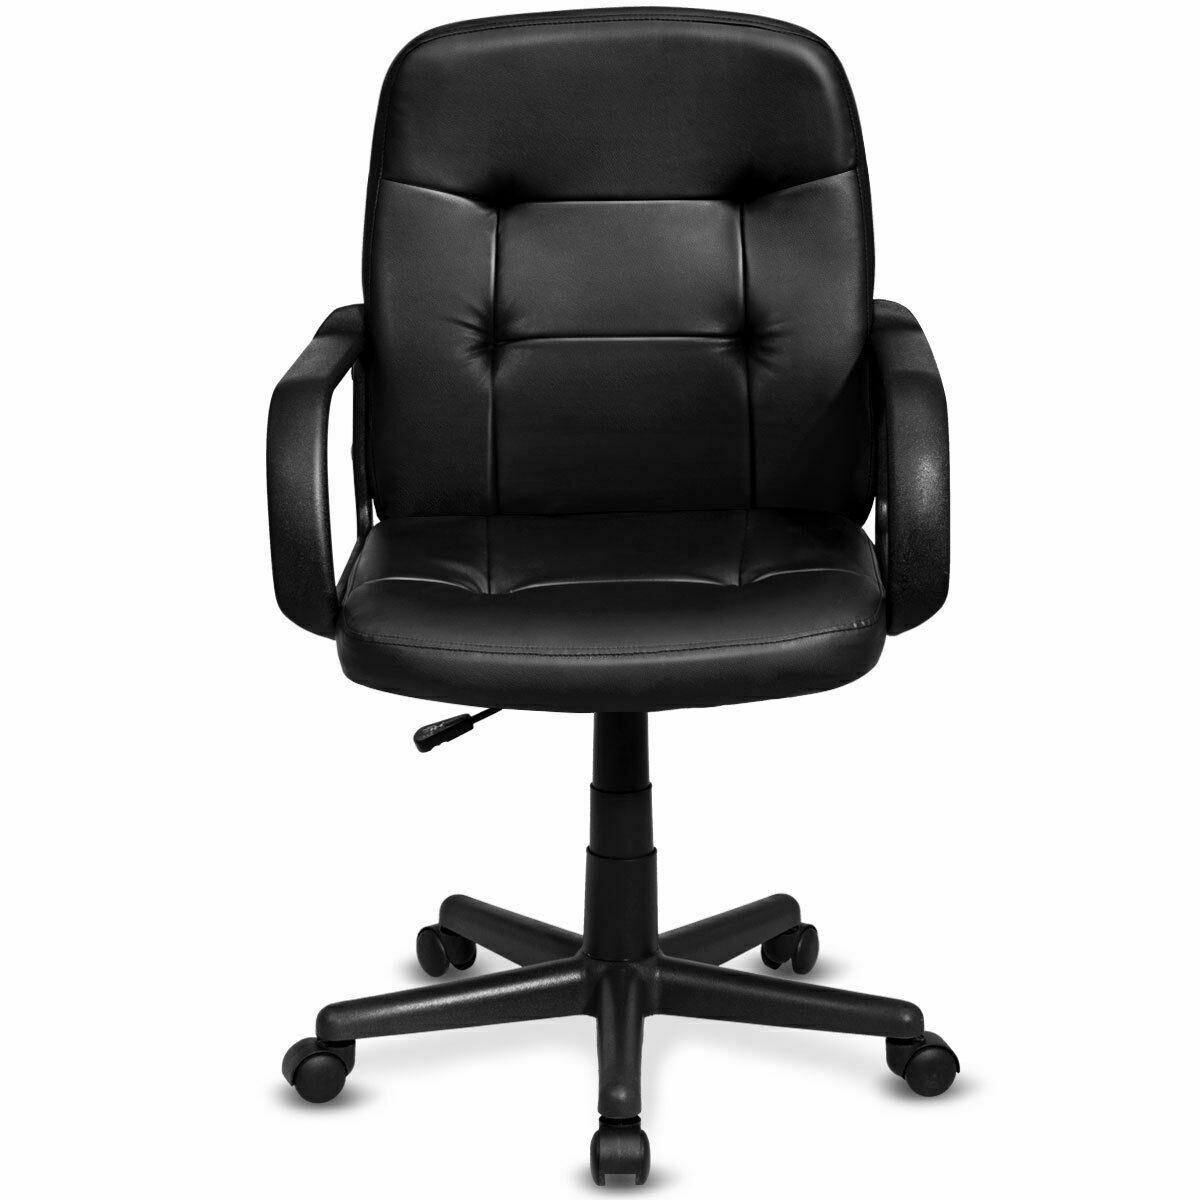 Ergonomic Mid-Back Executive Swivel Office Chair